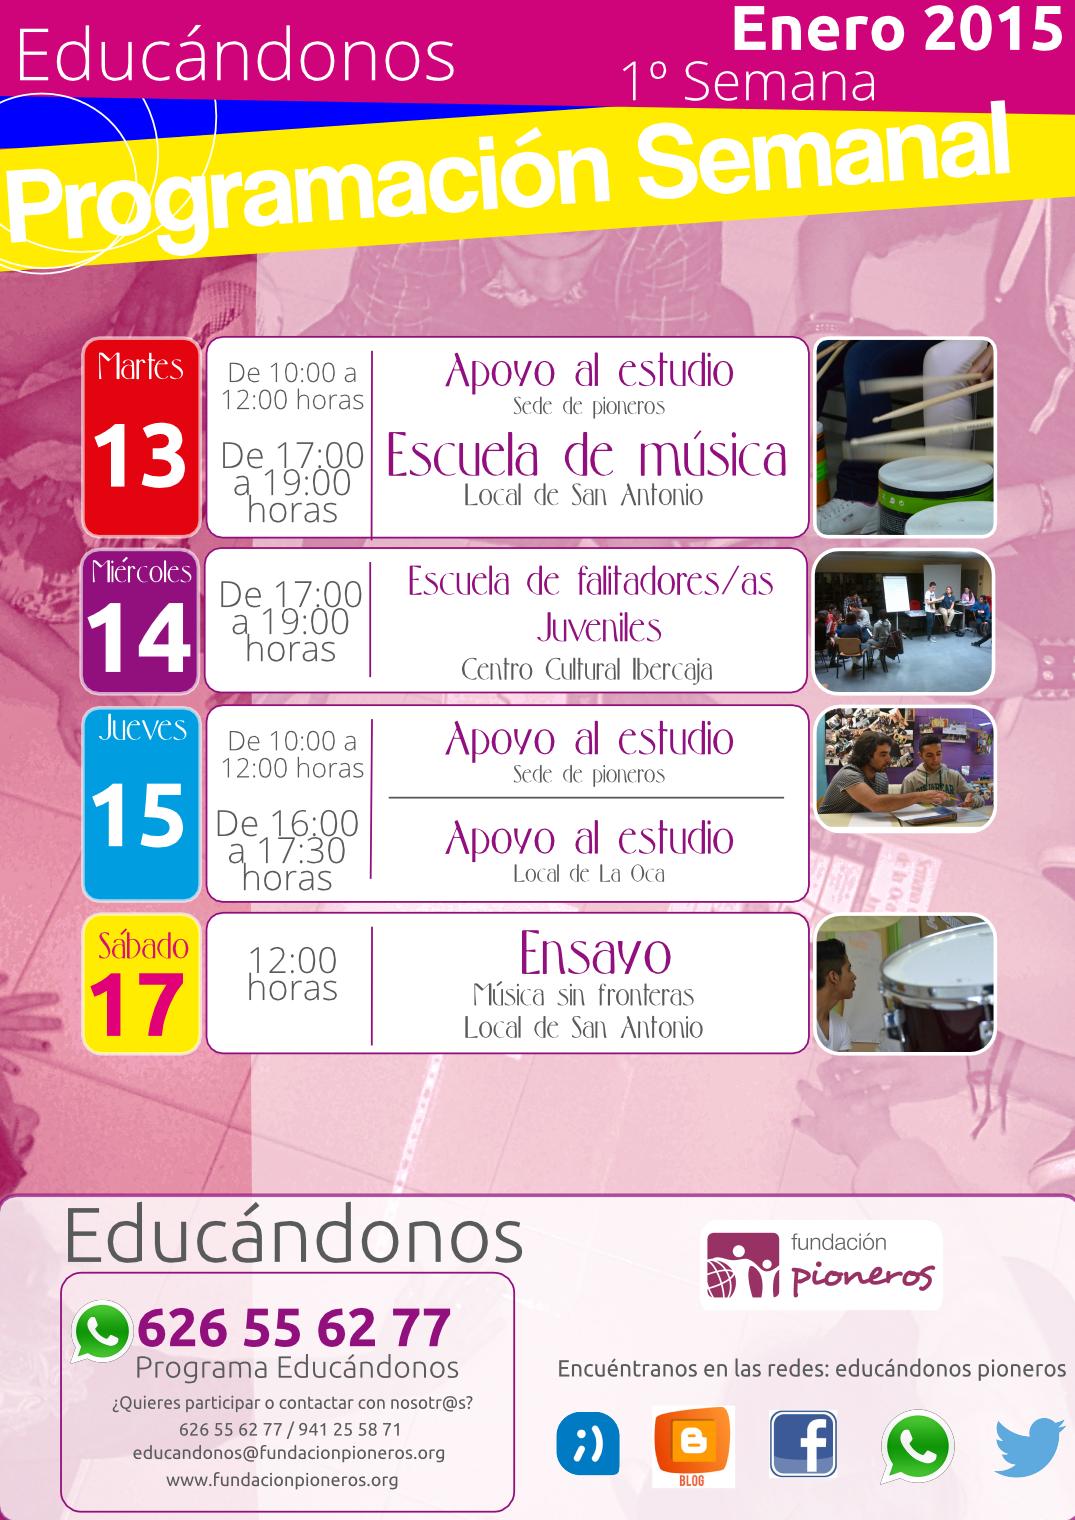 programaciónsemanaleducandonosEnero20151ºsemana-página001